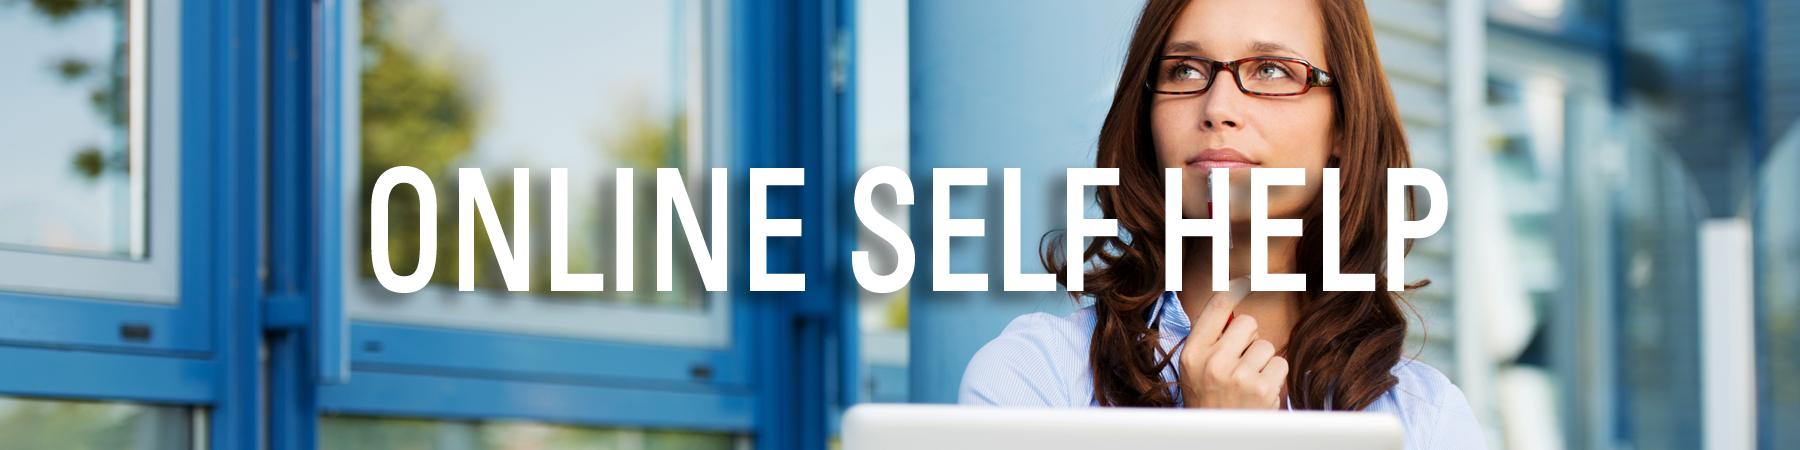 online self help